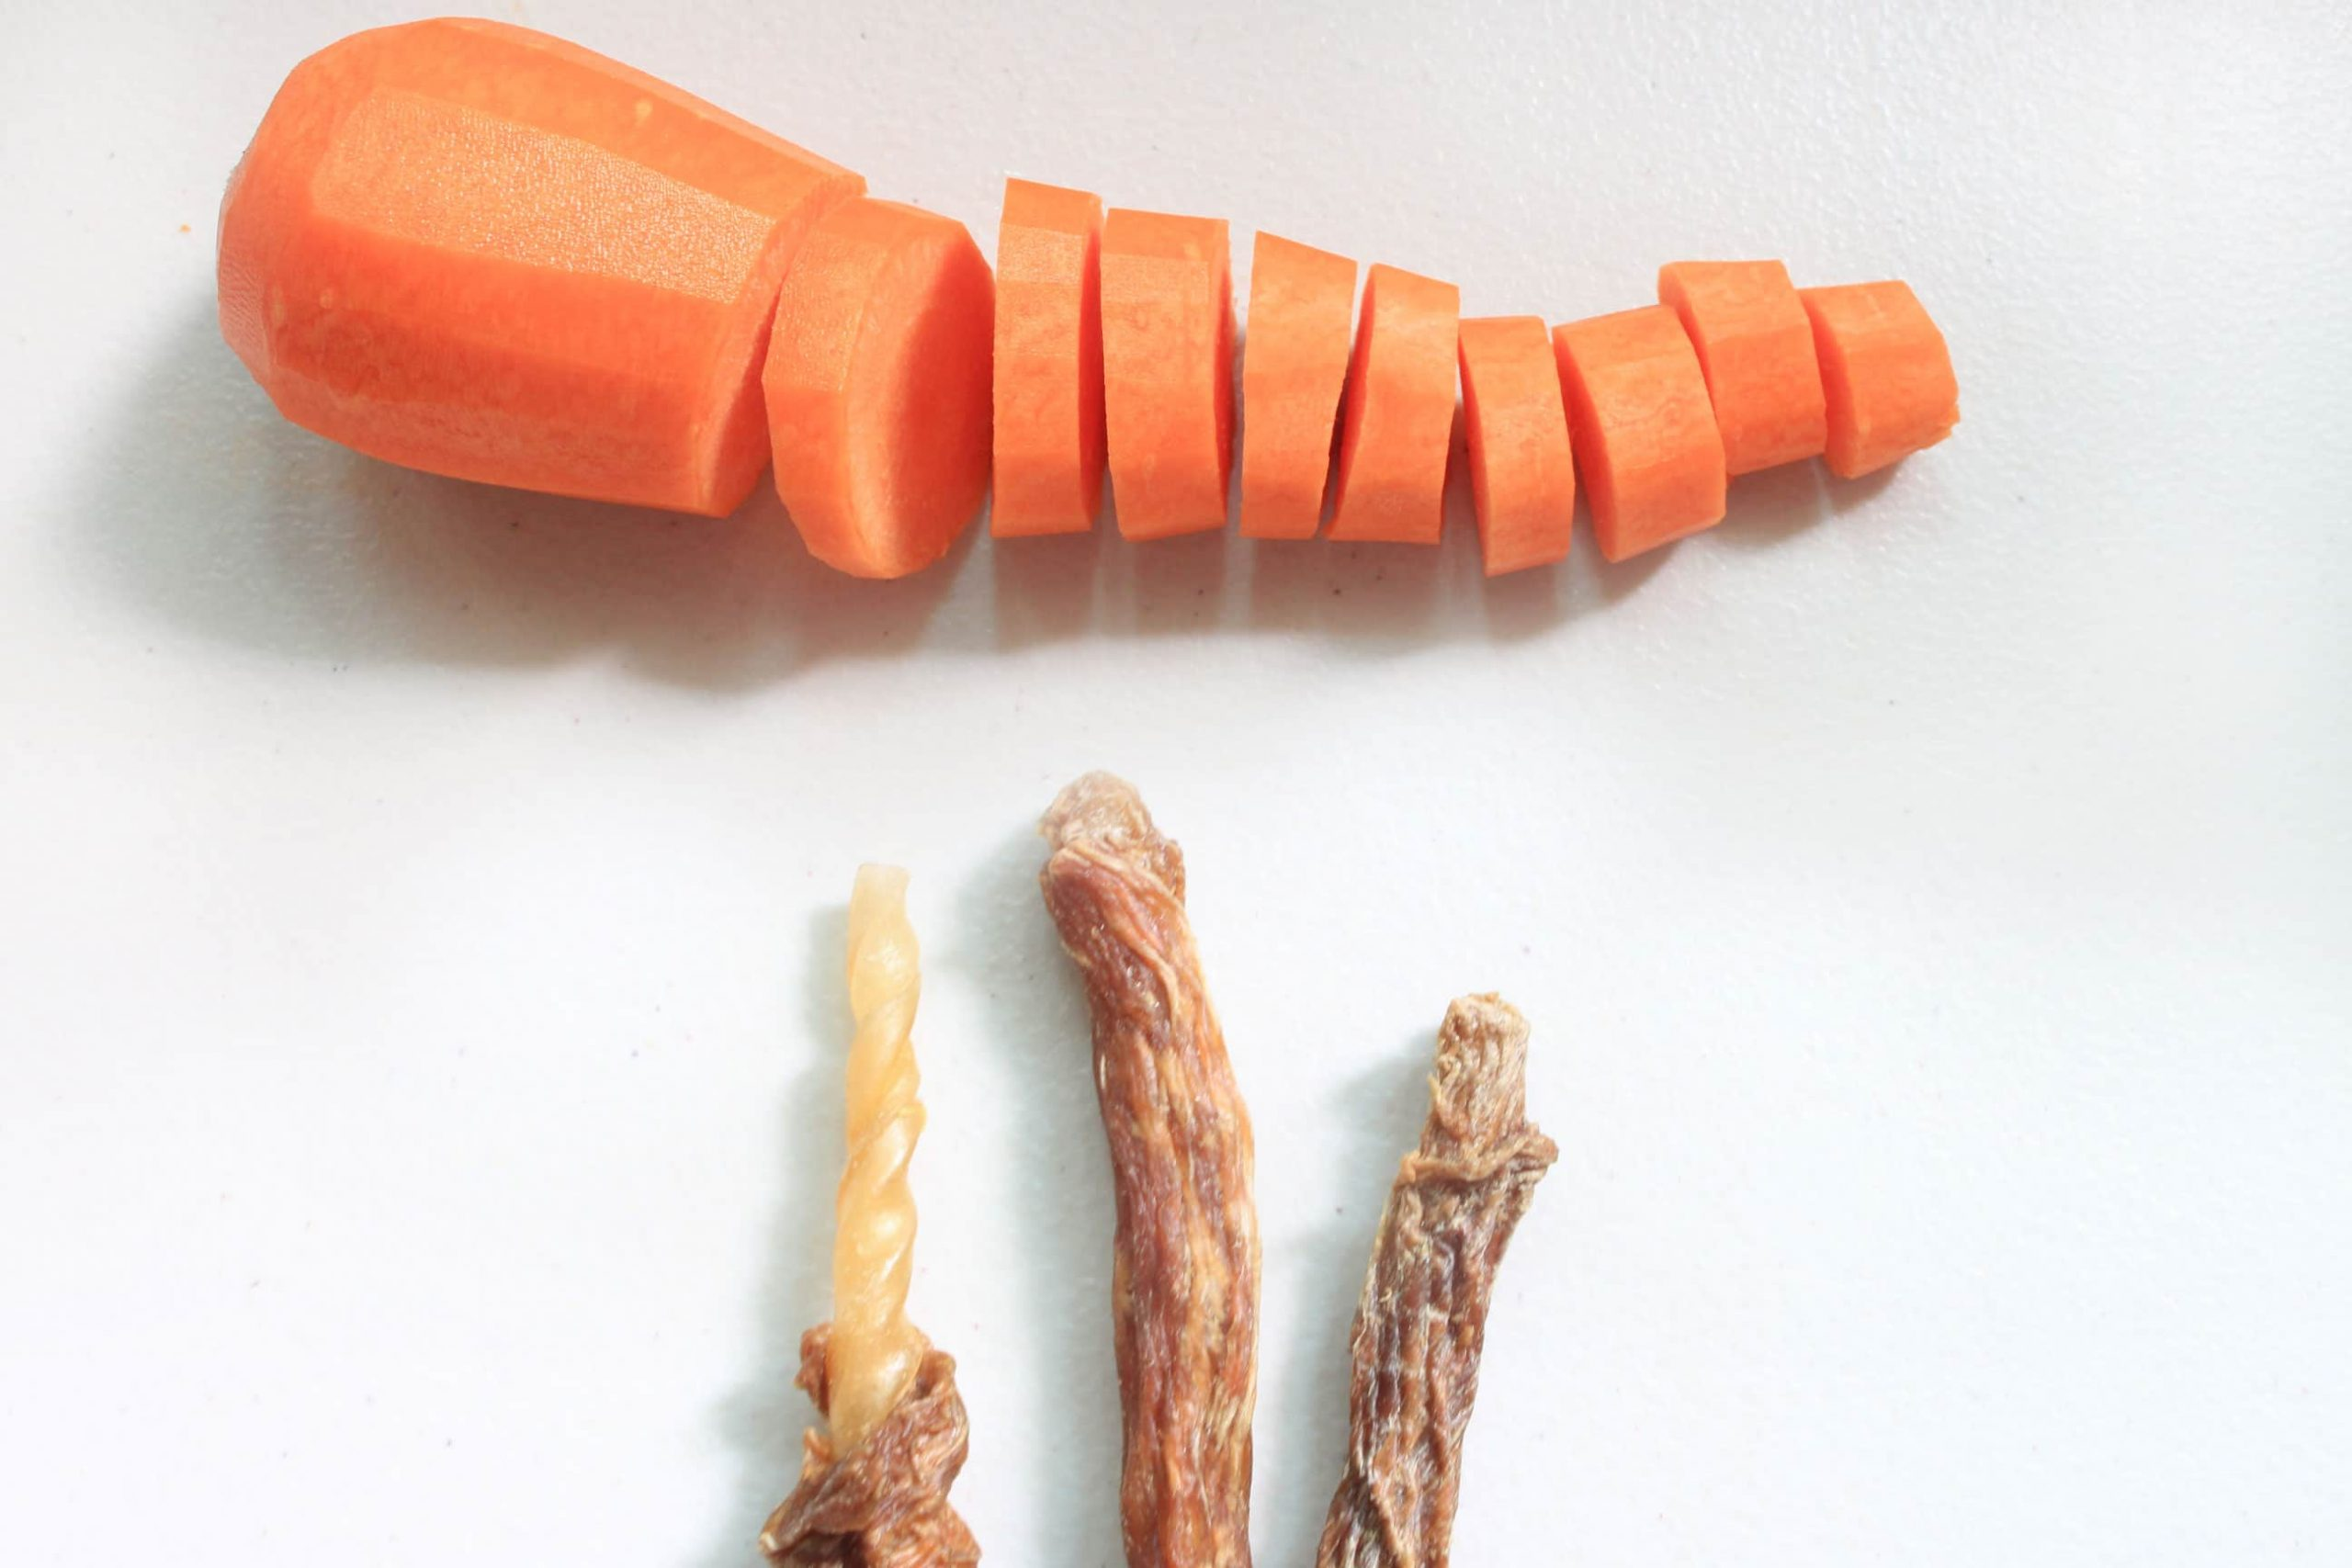 S3P2. 紅蘿蔔豬肉皮骨捲10支